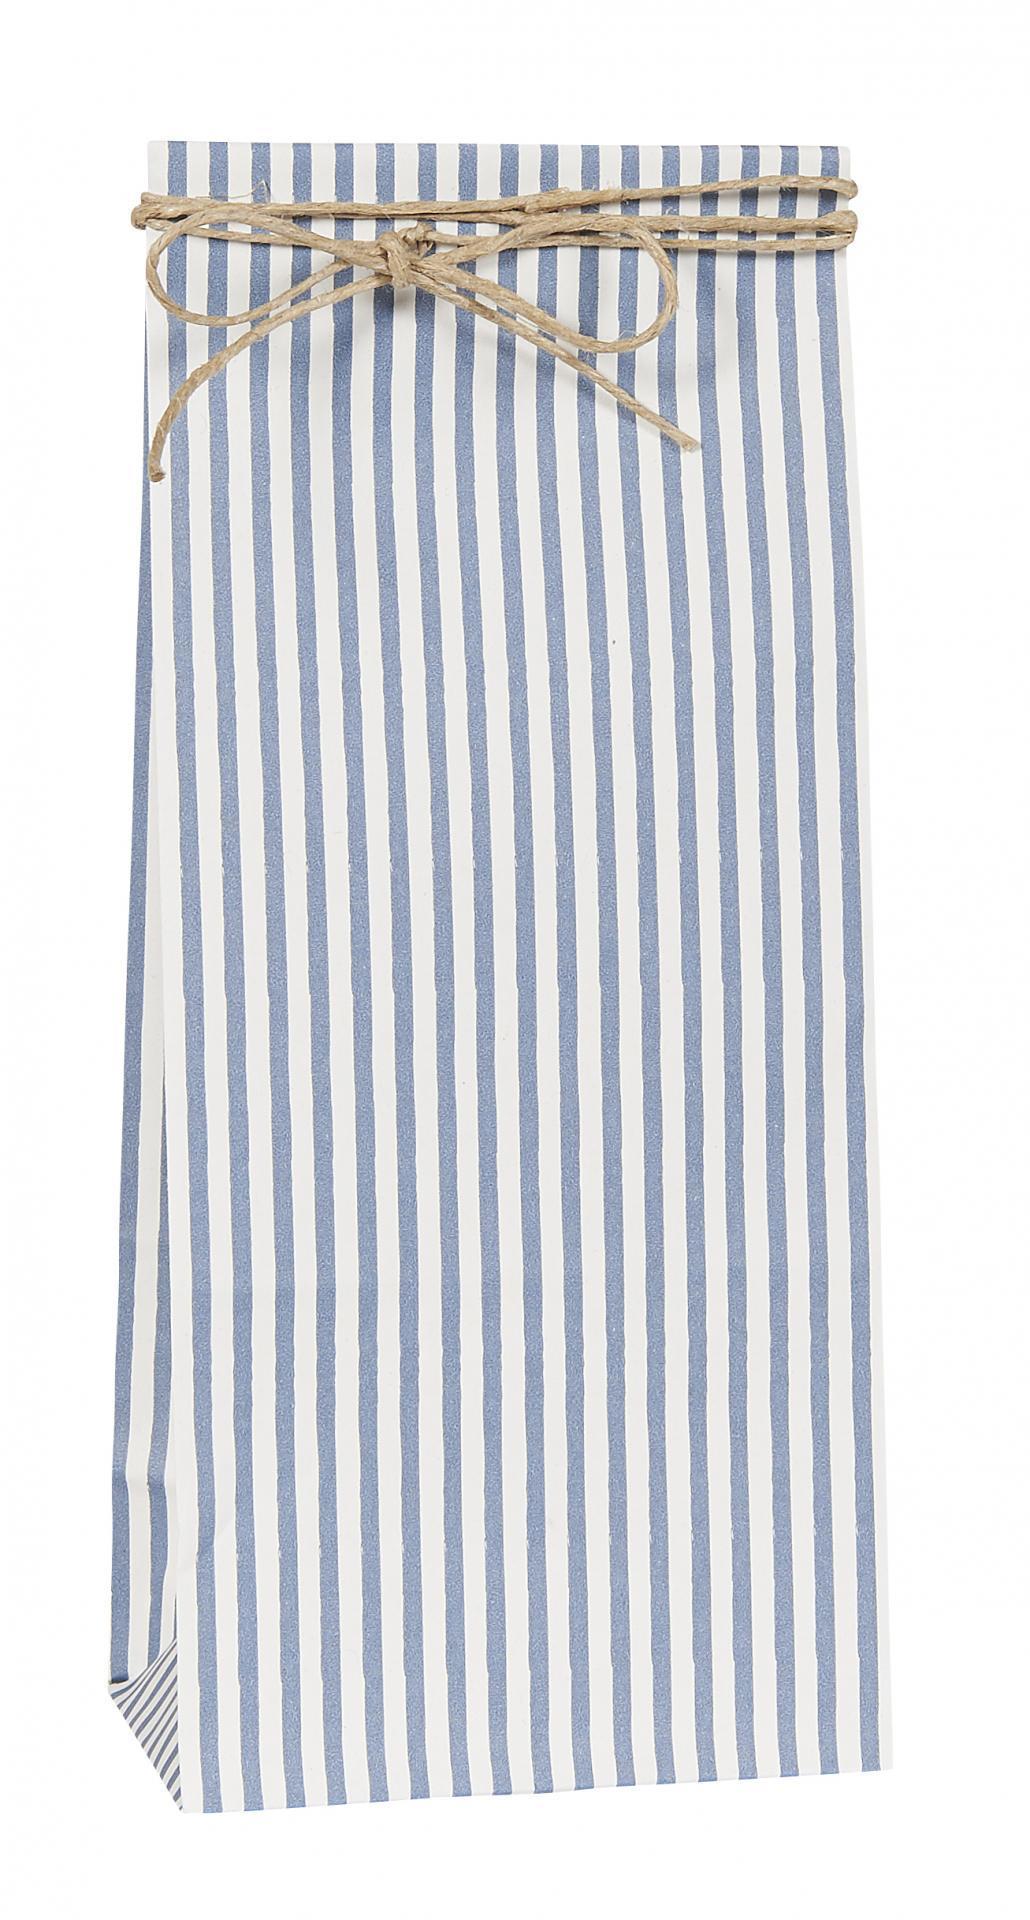 IB LAURSEN Papírový sáček Blue stripe S, modrá barva, bílá barva, papír